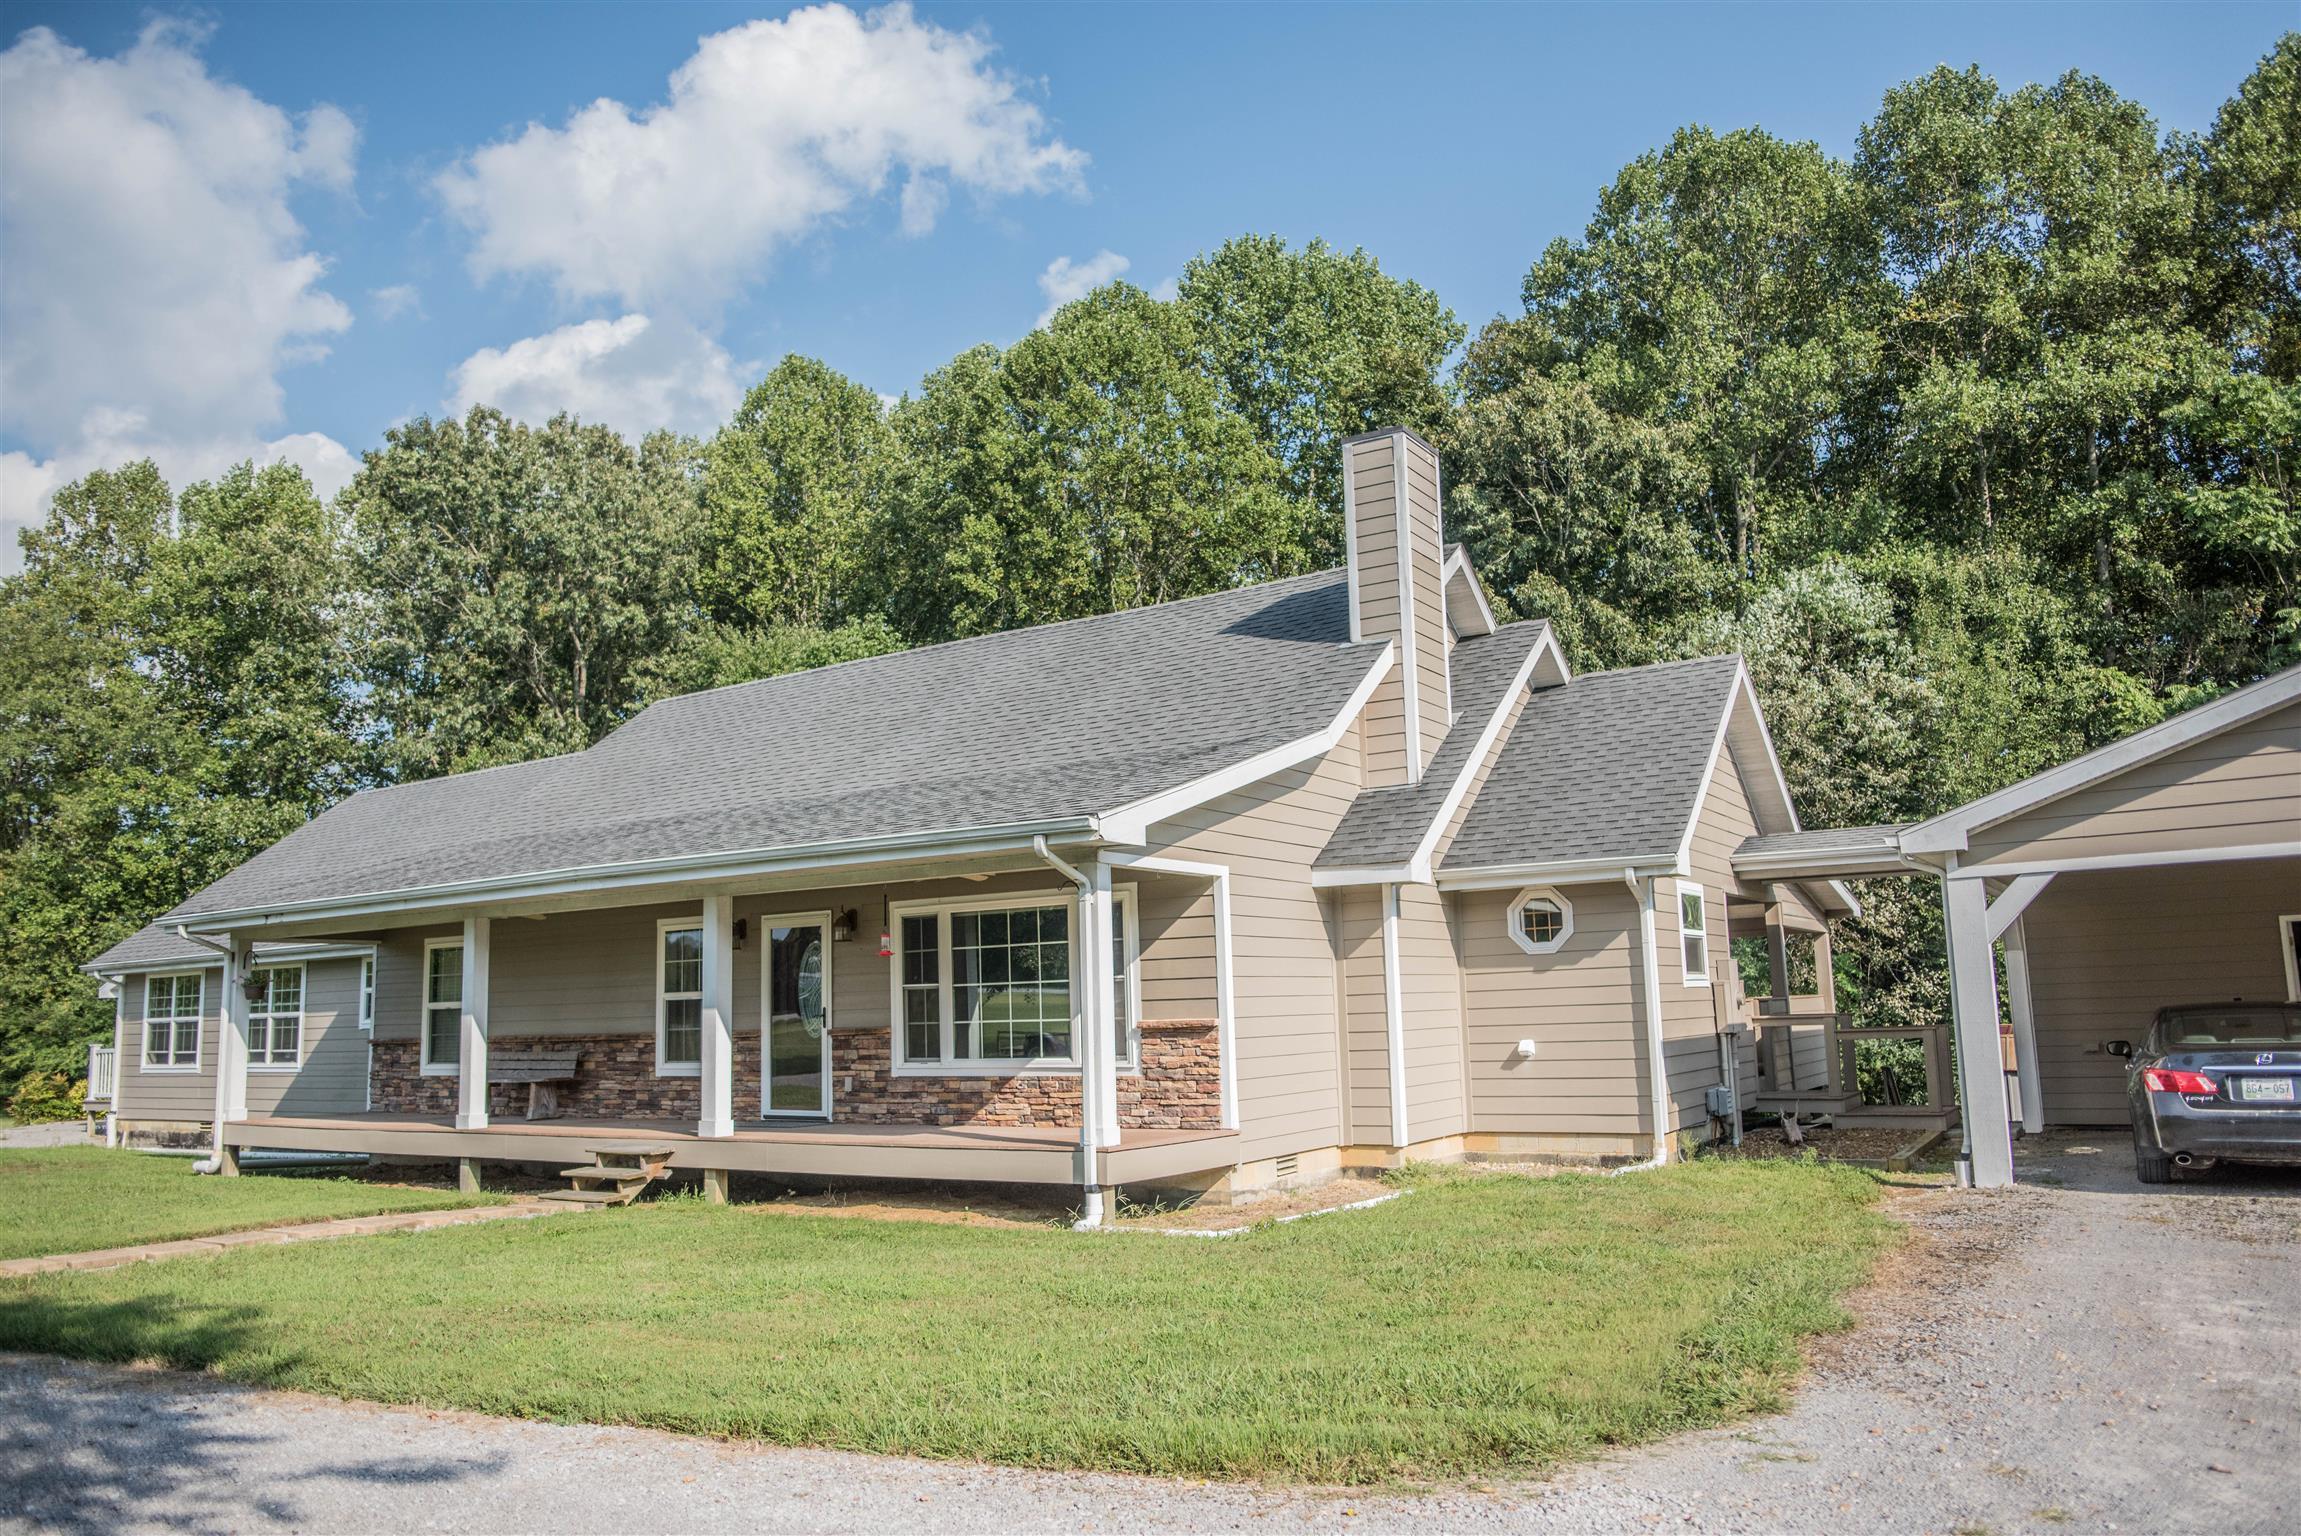 2516 Cookeville Hwy, Smithville, TN 37166 - Smithville, TN real estate listing